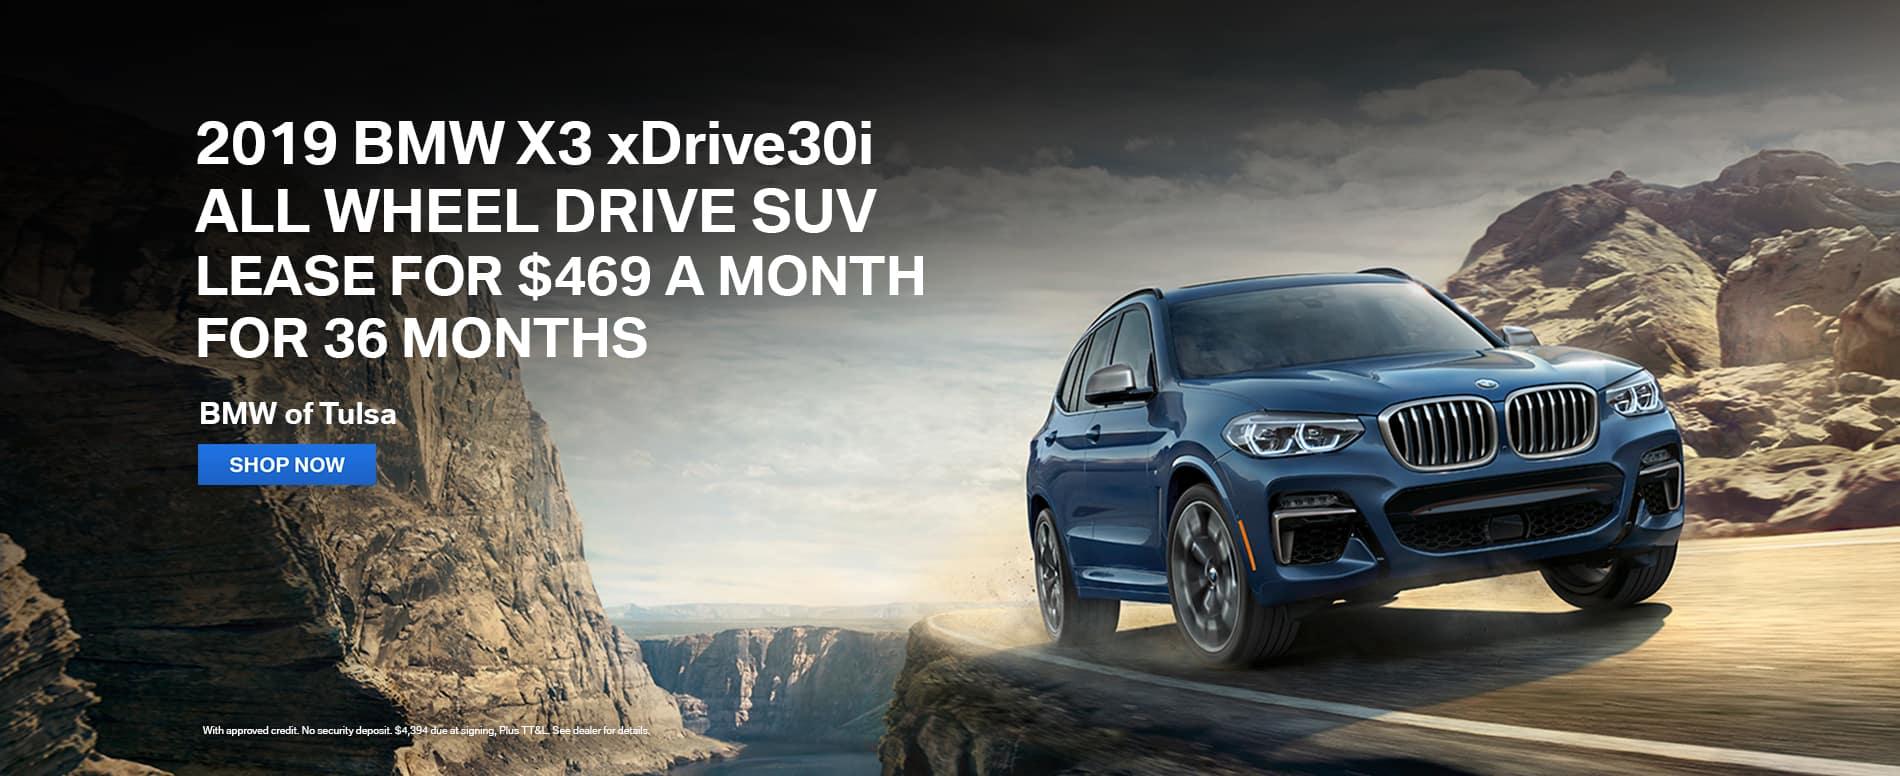 lease-2019-bmw-x3-xdrive30i-awd-suv-tulsa